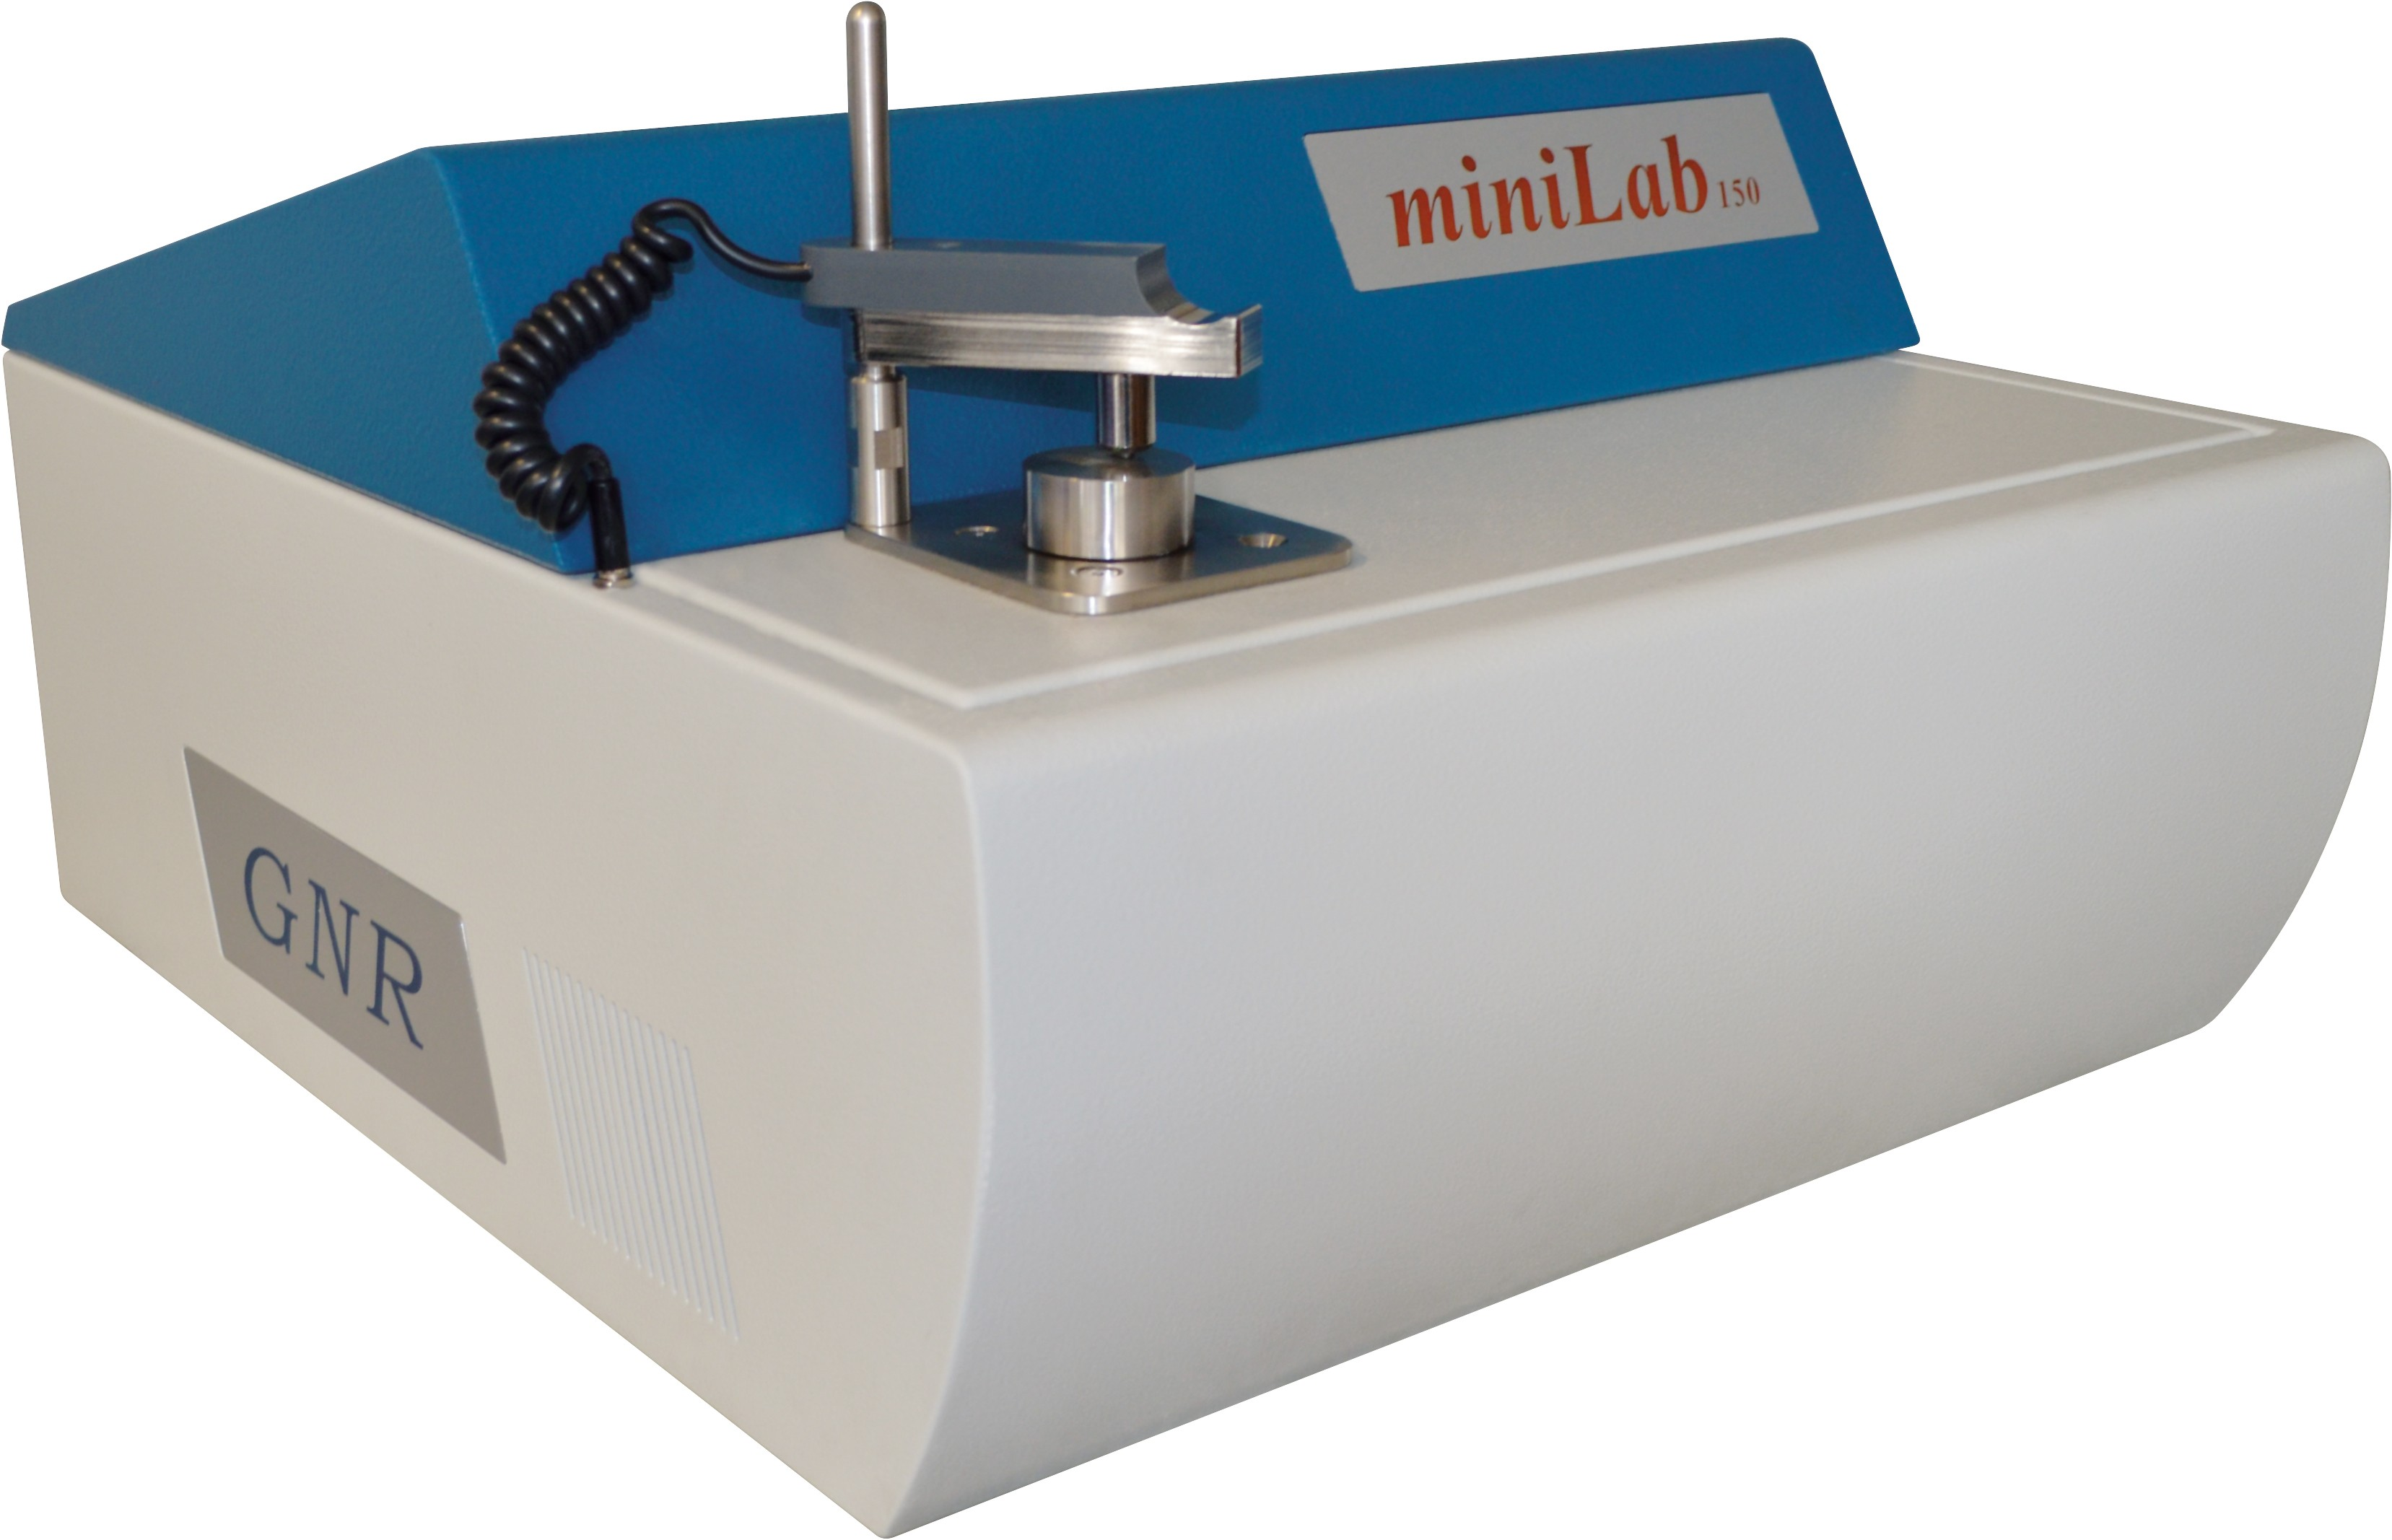 Mini Lab 150